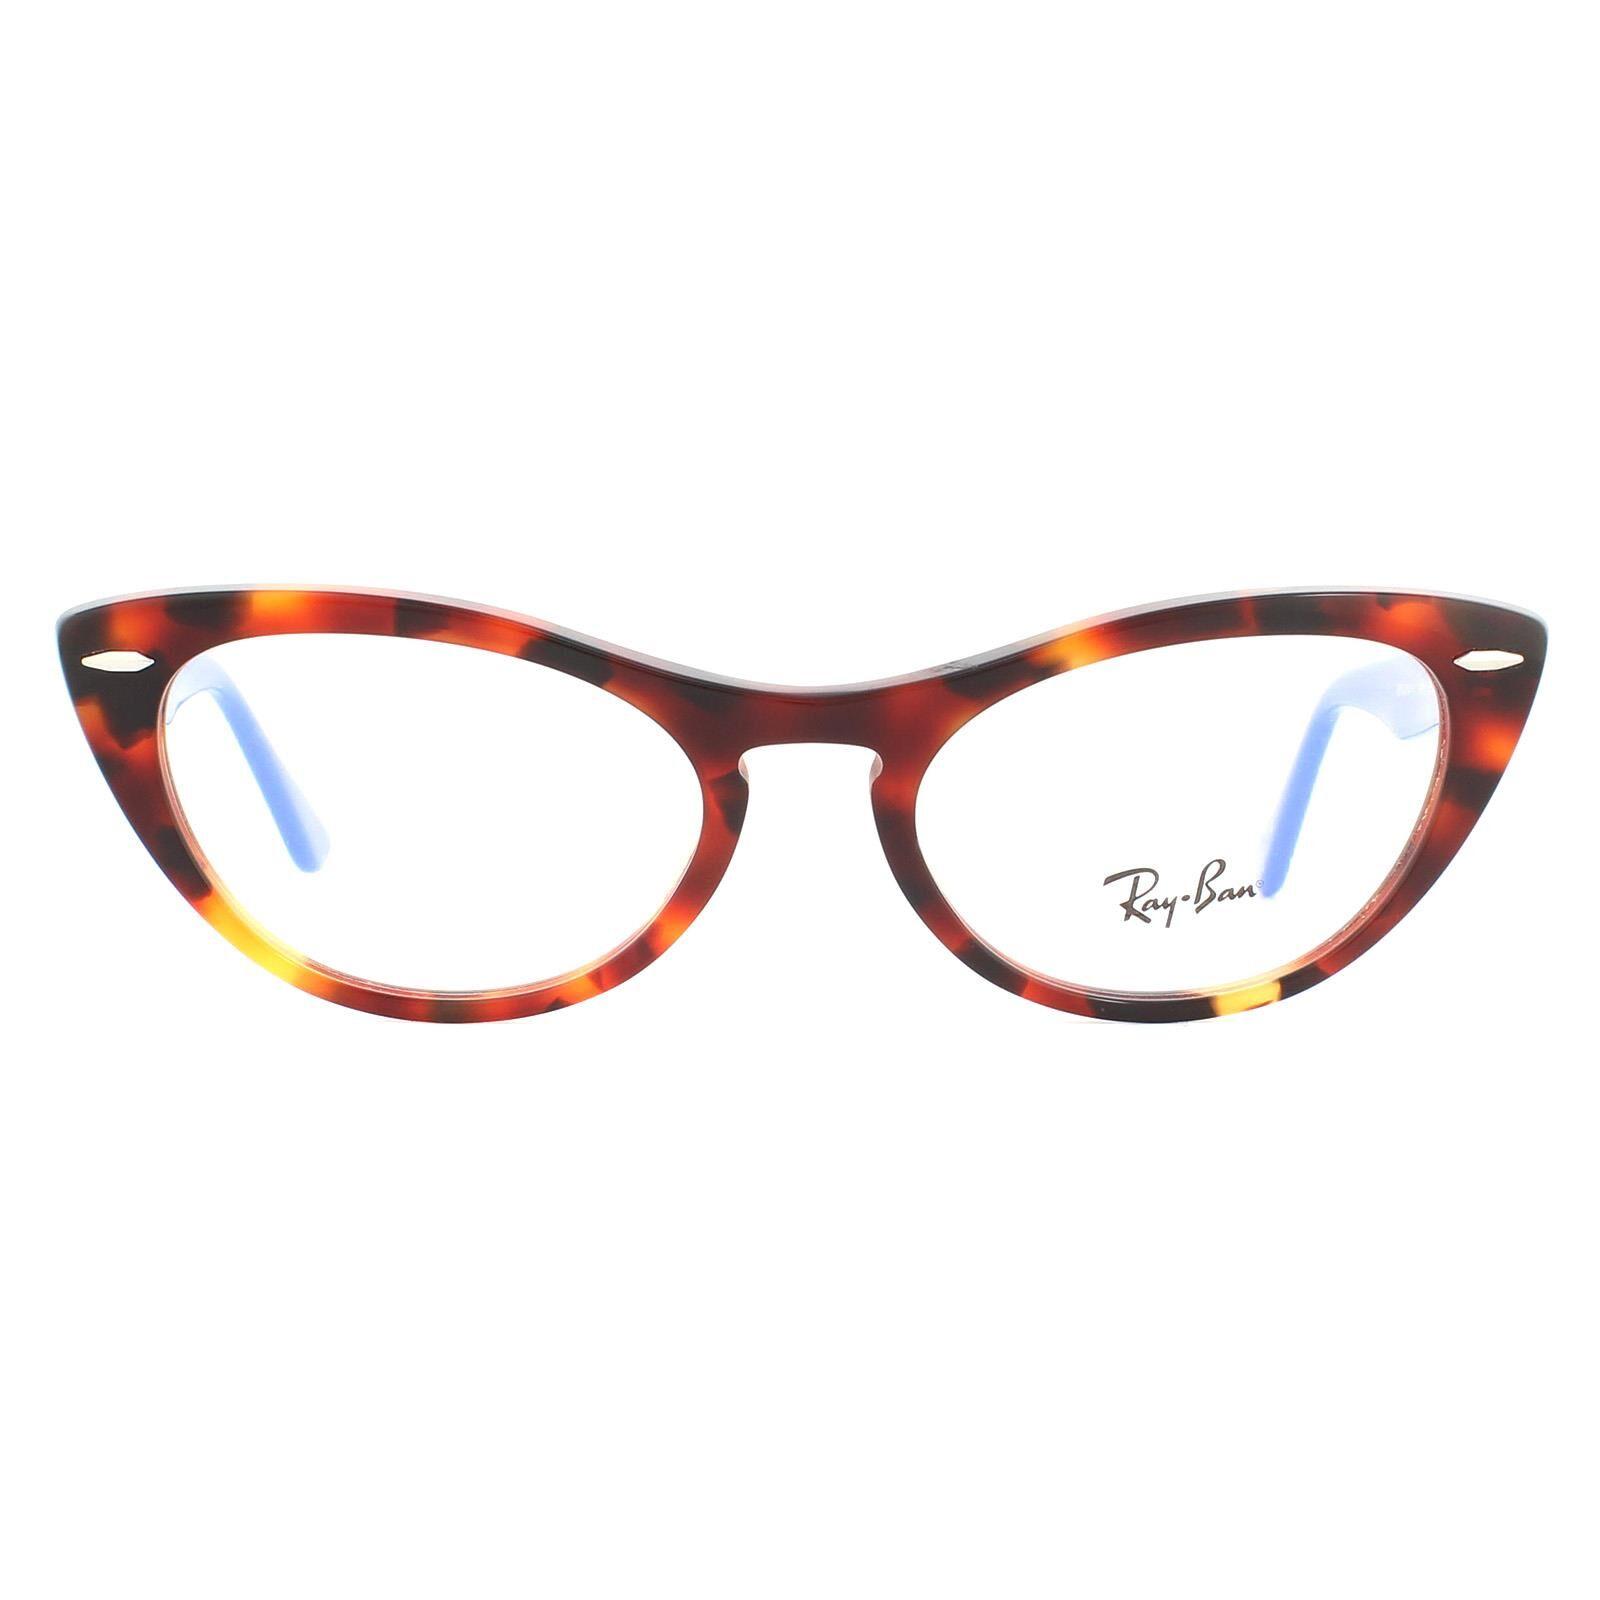 Ray-Ban Glasses Frames RX4314V Nina 5936 Havana Blue Women  - Size: 54